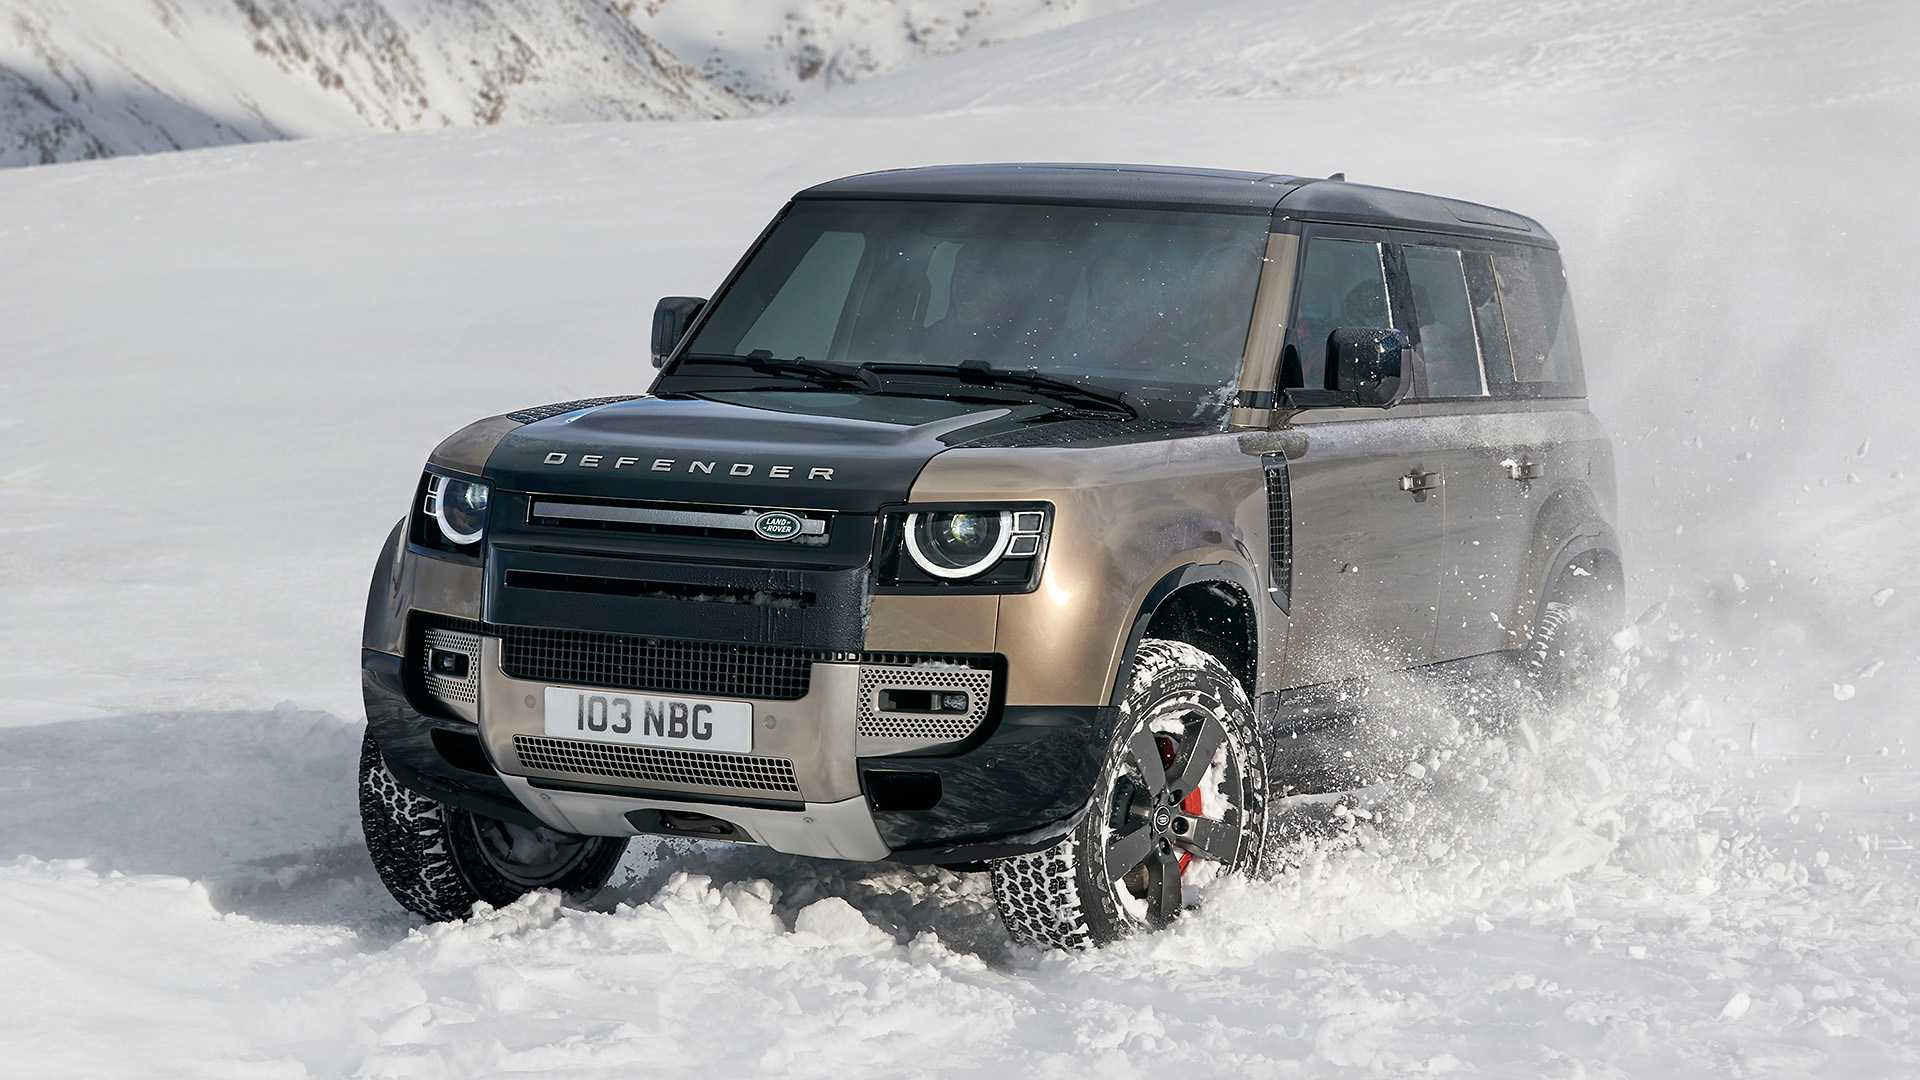 2020 Land Rover Defender India Launch Next Year: 5 Things To Know - GaadiWaadi.com thumbnail